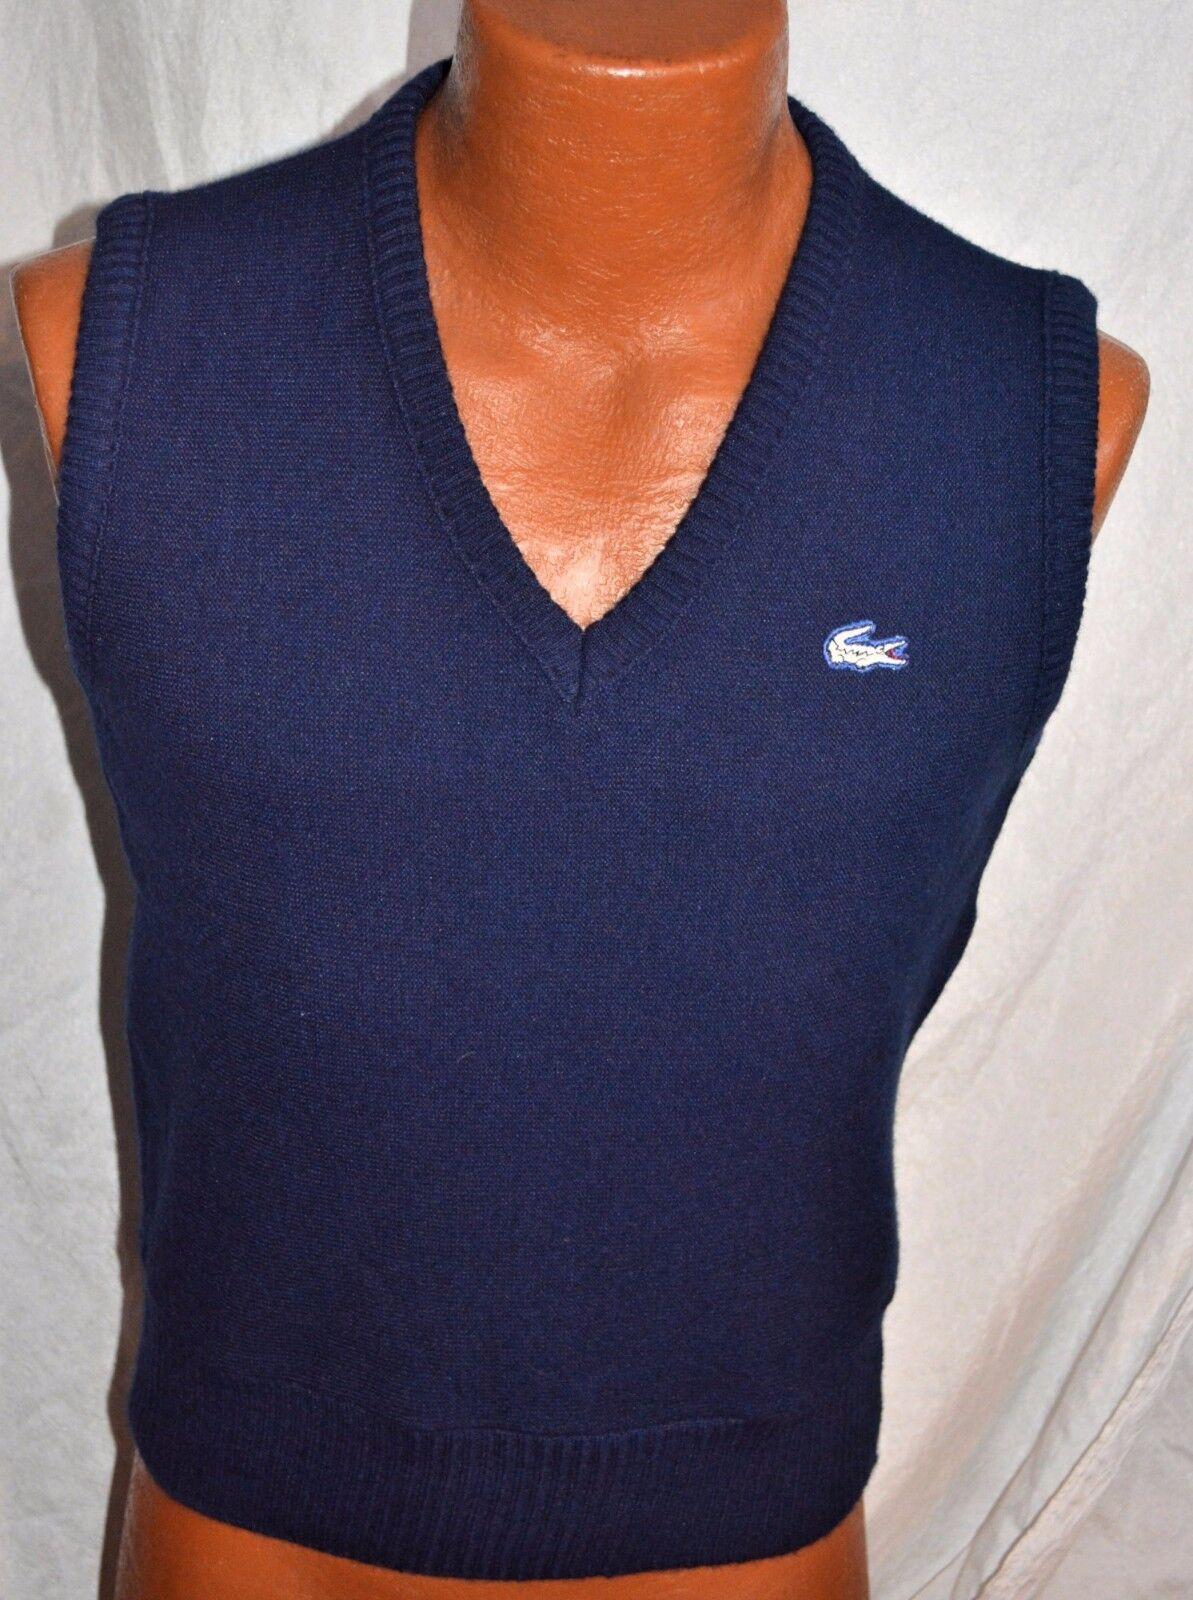 Vintage 1970s Izod Lacoste Mens Sweater Vest Adult 34 white LOGO  SUPERB unisex